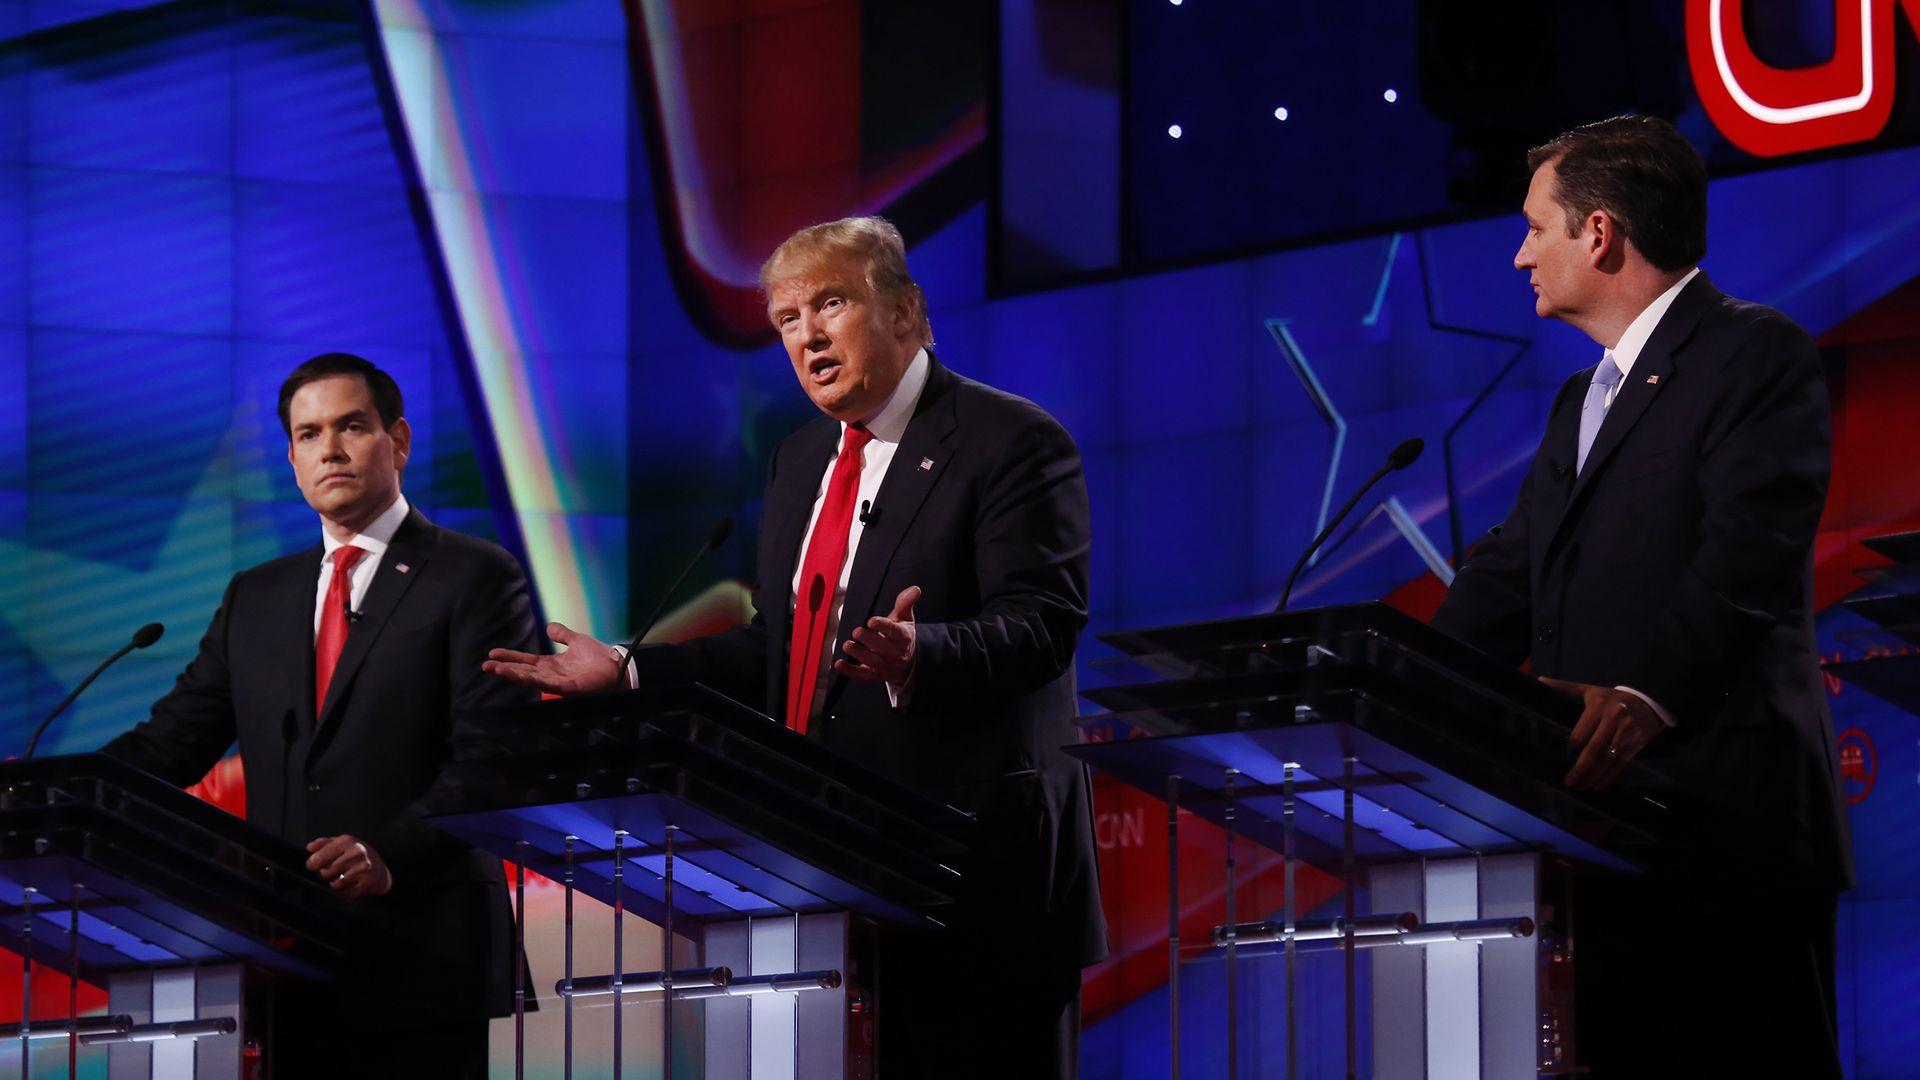 Rubio, Trump and Cruz